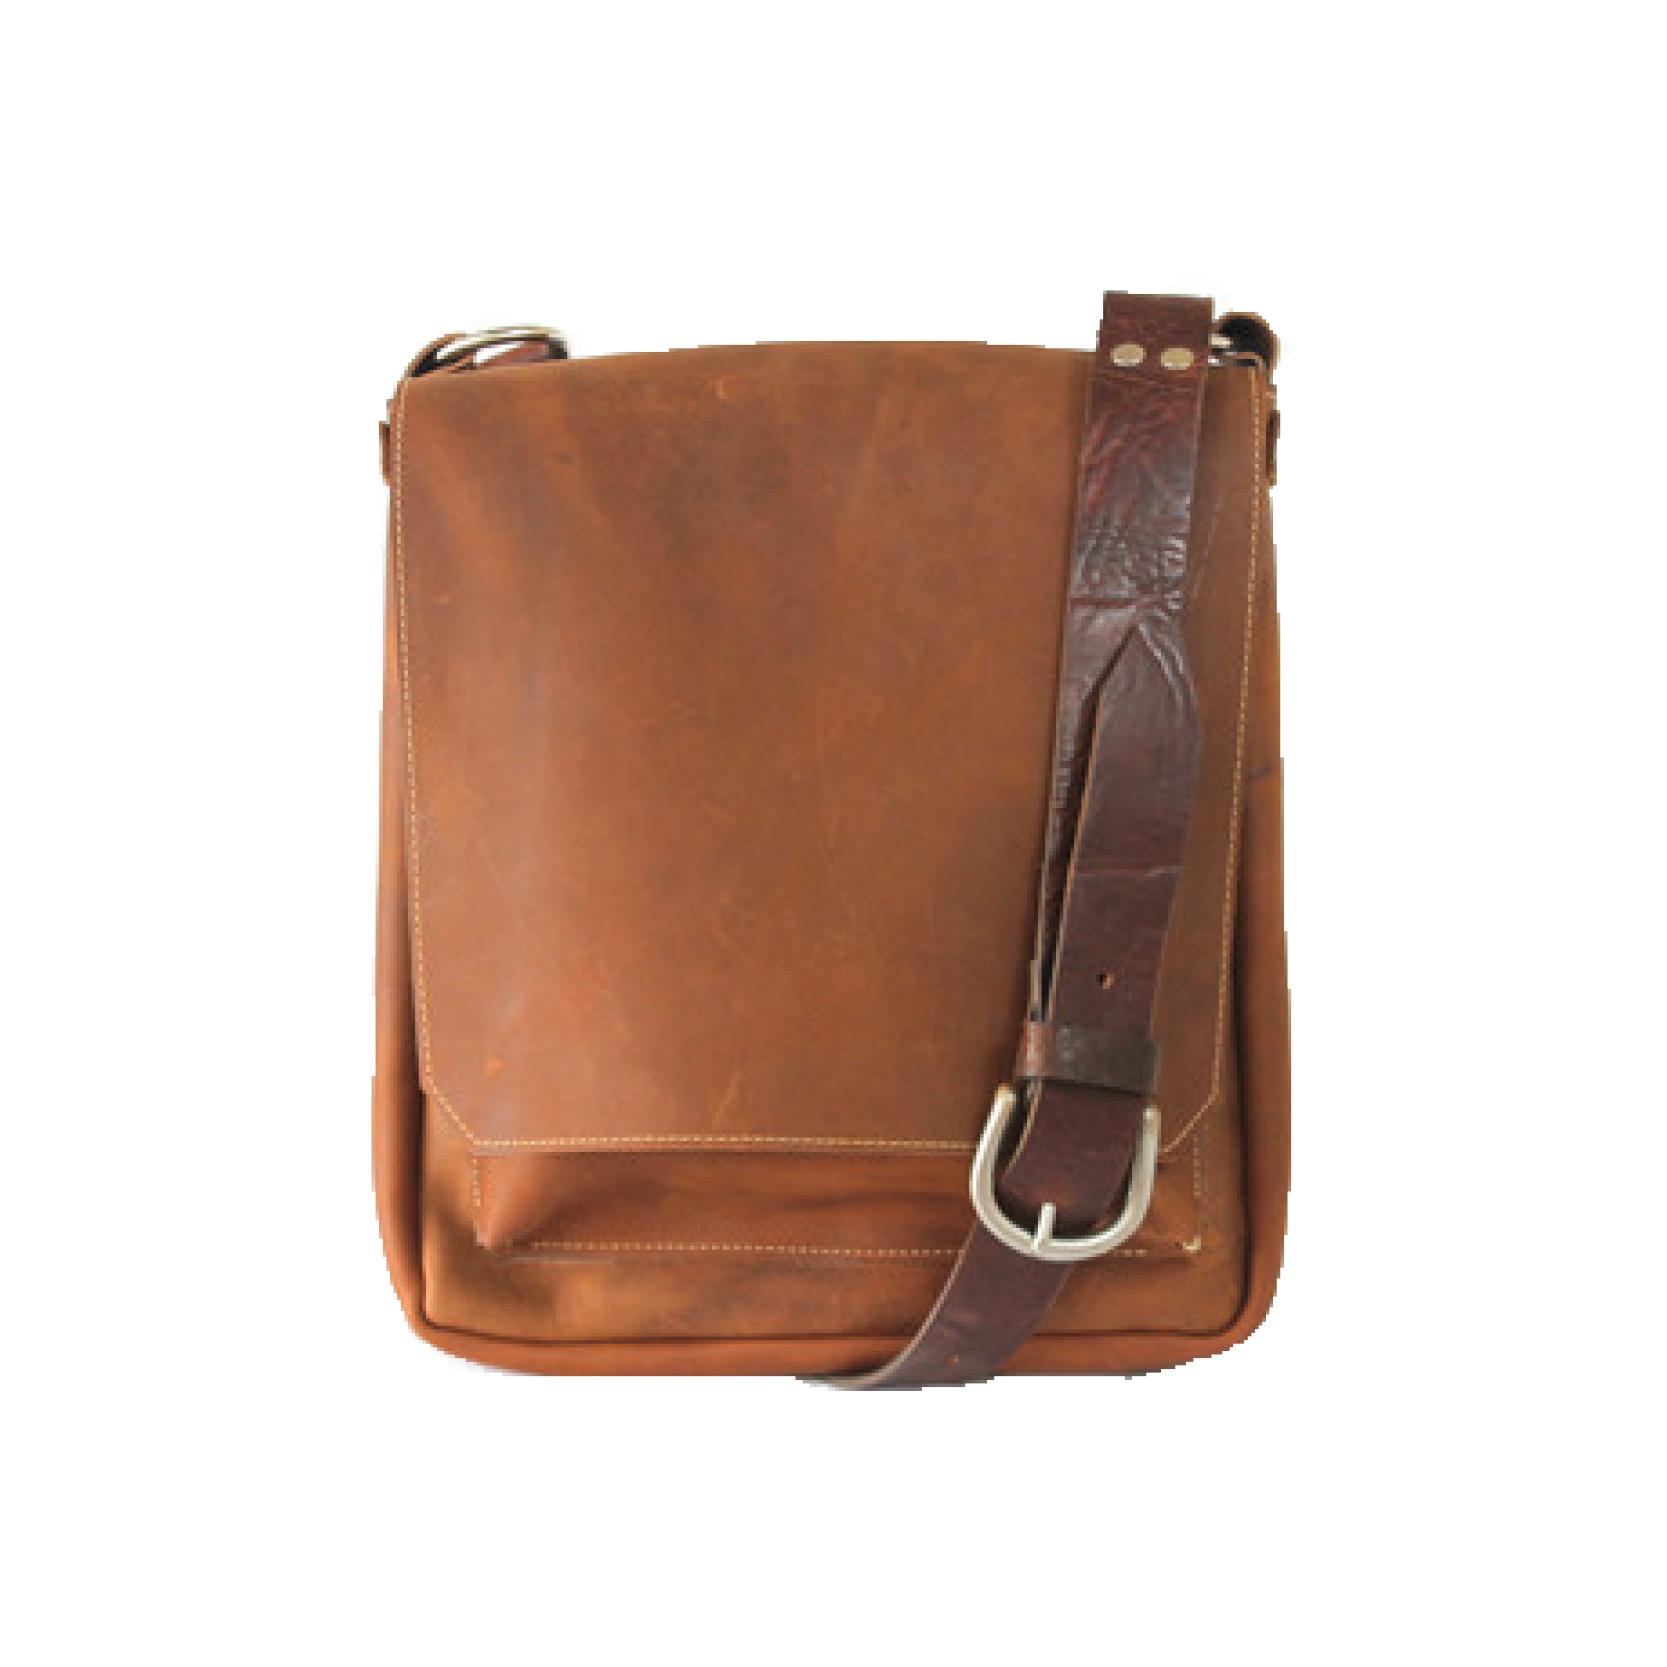 ba2cefee6c7 The Outback Messenger Bag